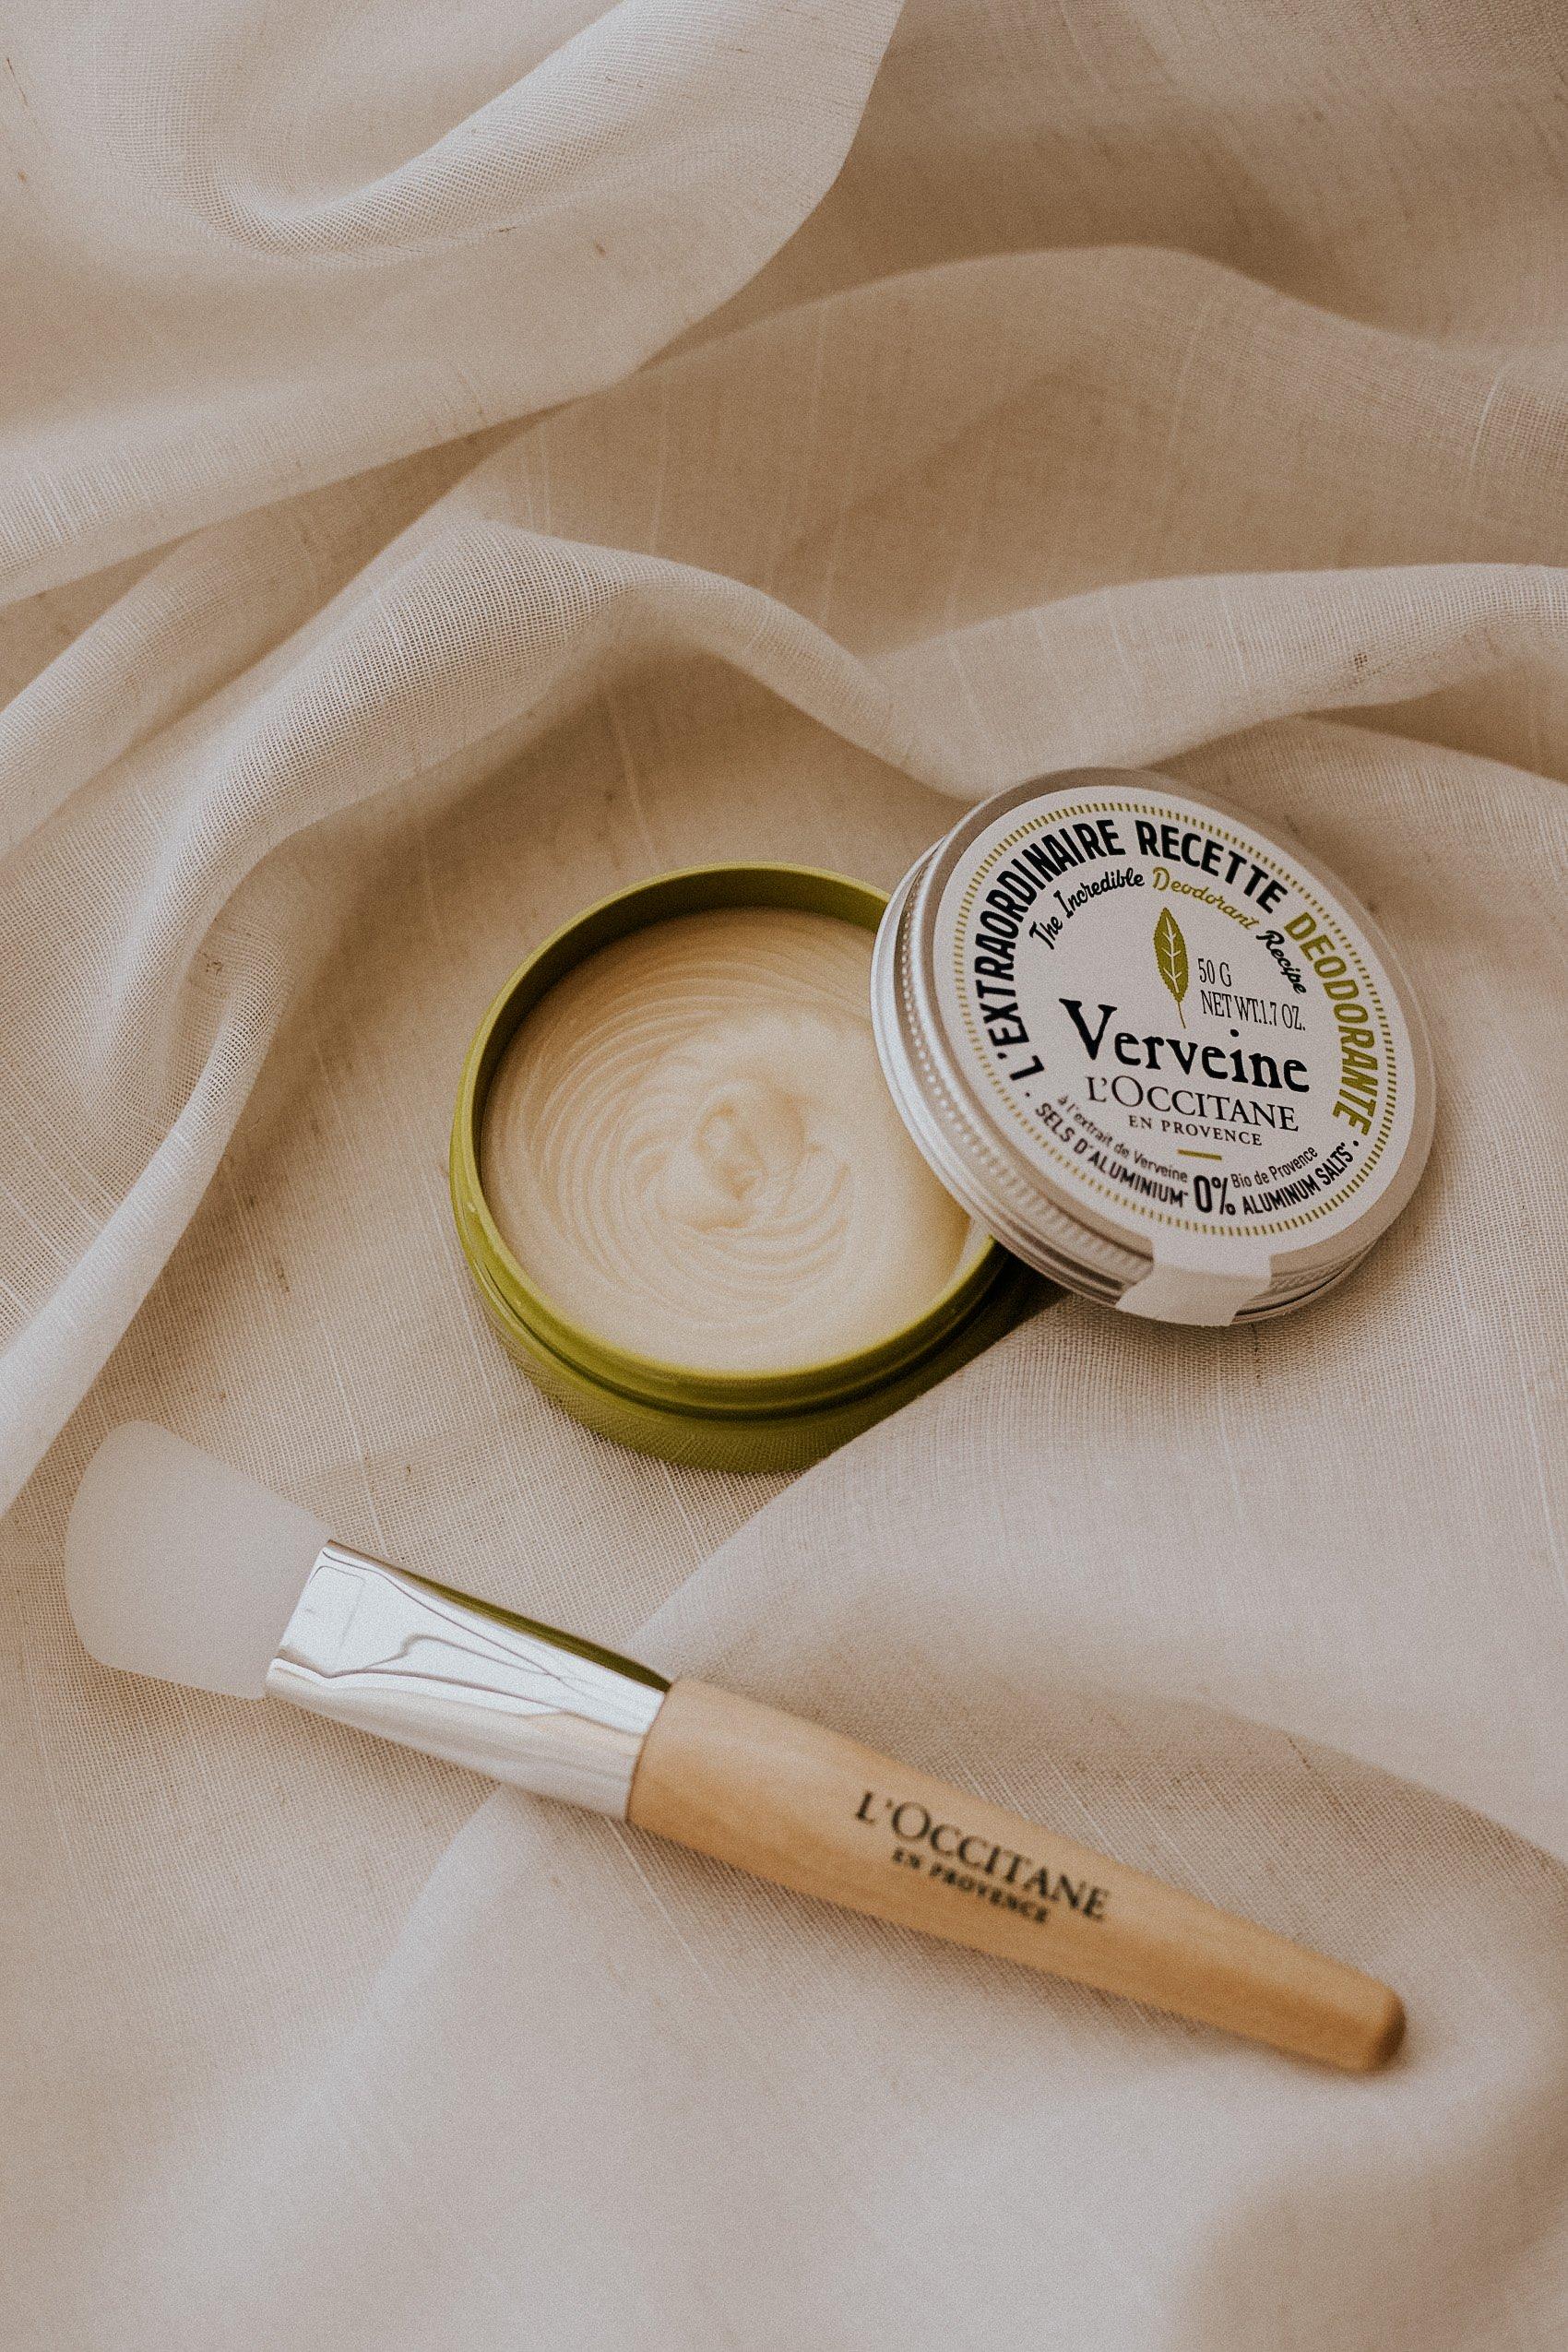 L'Occitane Deodorant Balm